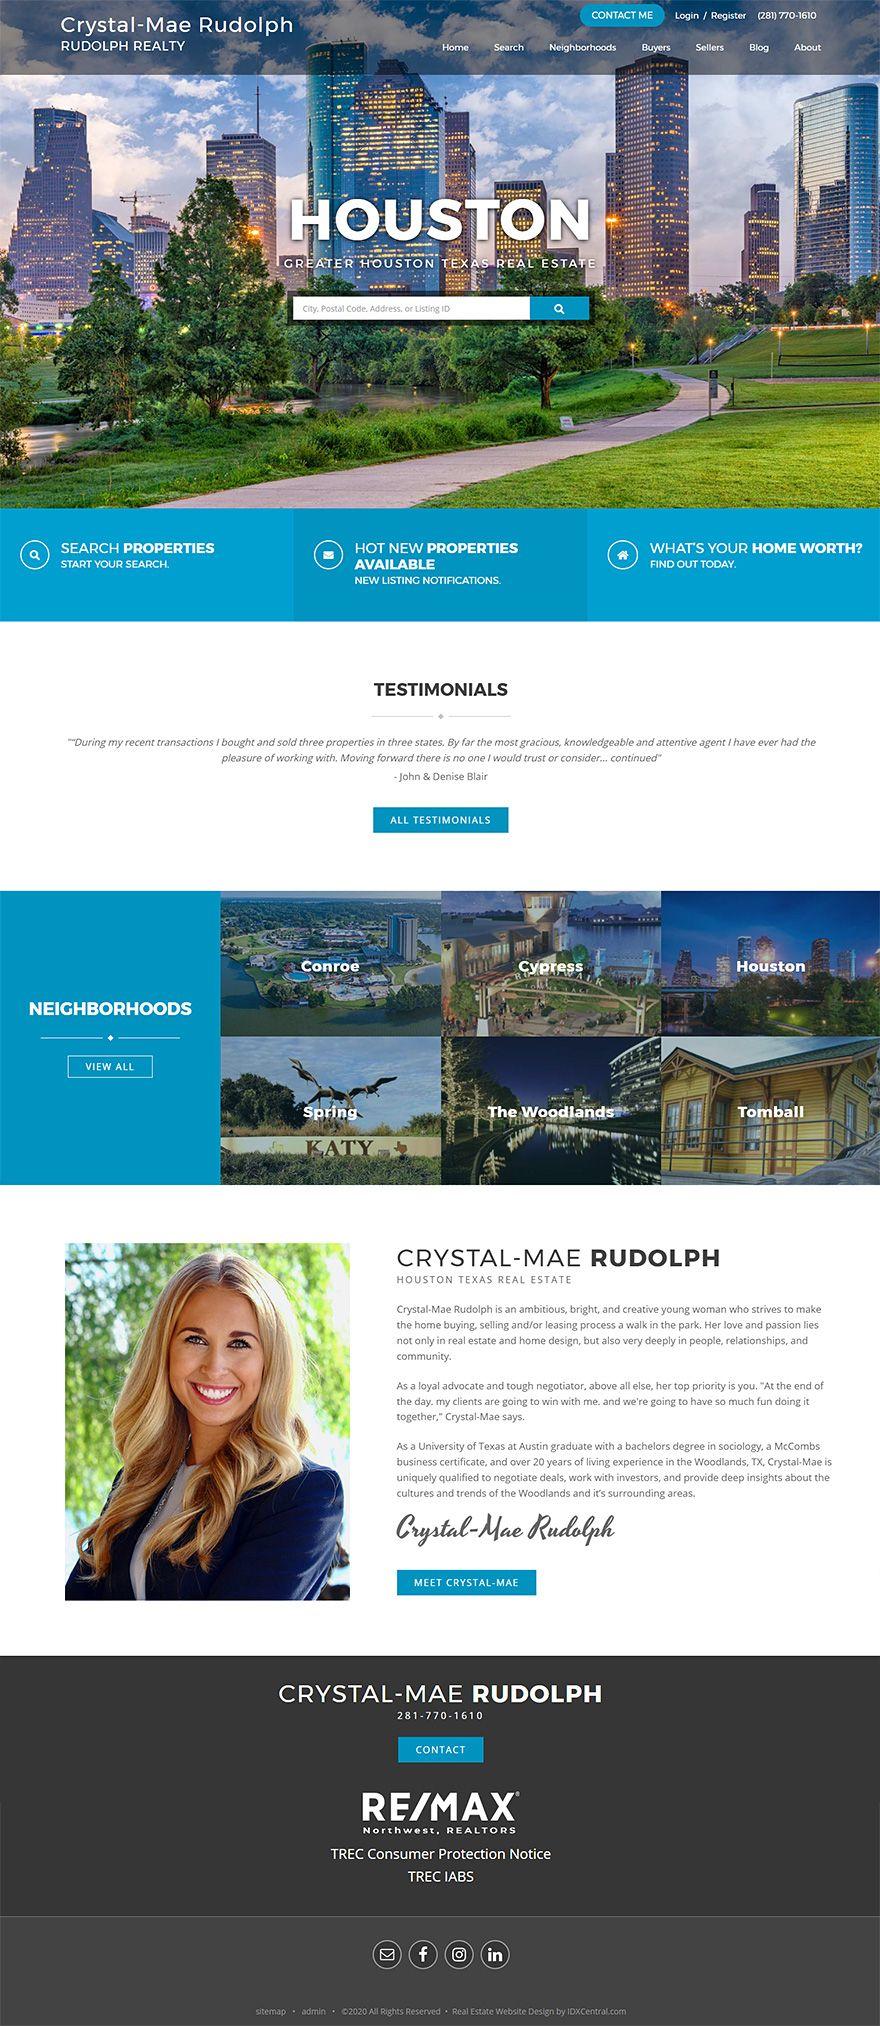 Texas Houston Texasrealtor Crystal Mae Rudolph S Website Is Built On Our Popular Wordpress R In 2020 Real Estate Website Design Realtor Websites Real Estate Website